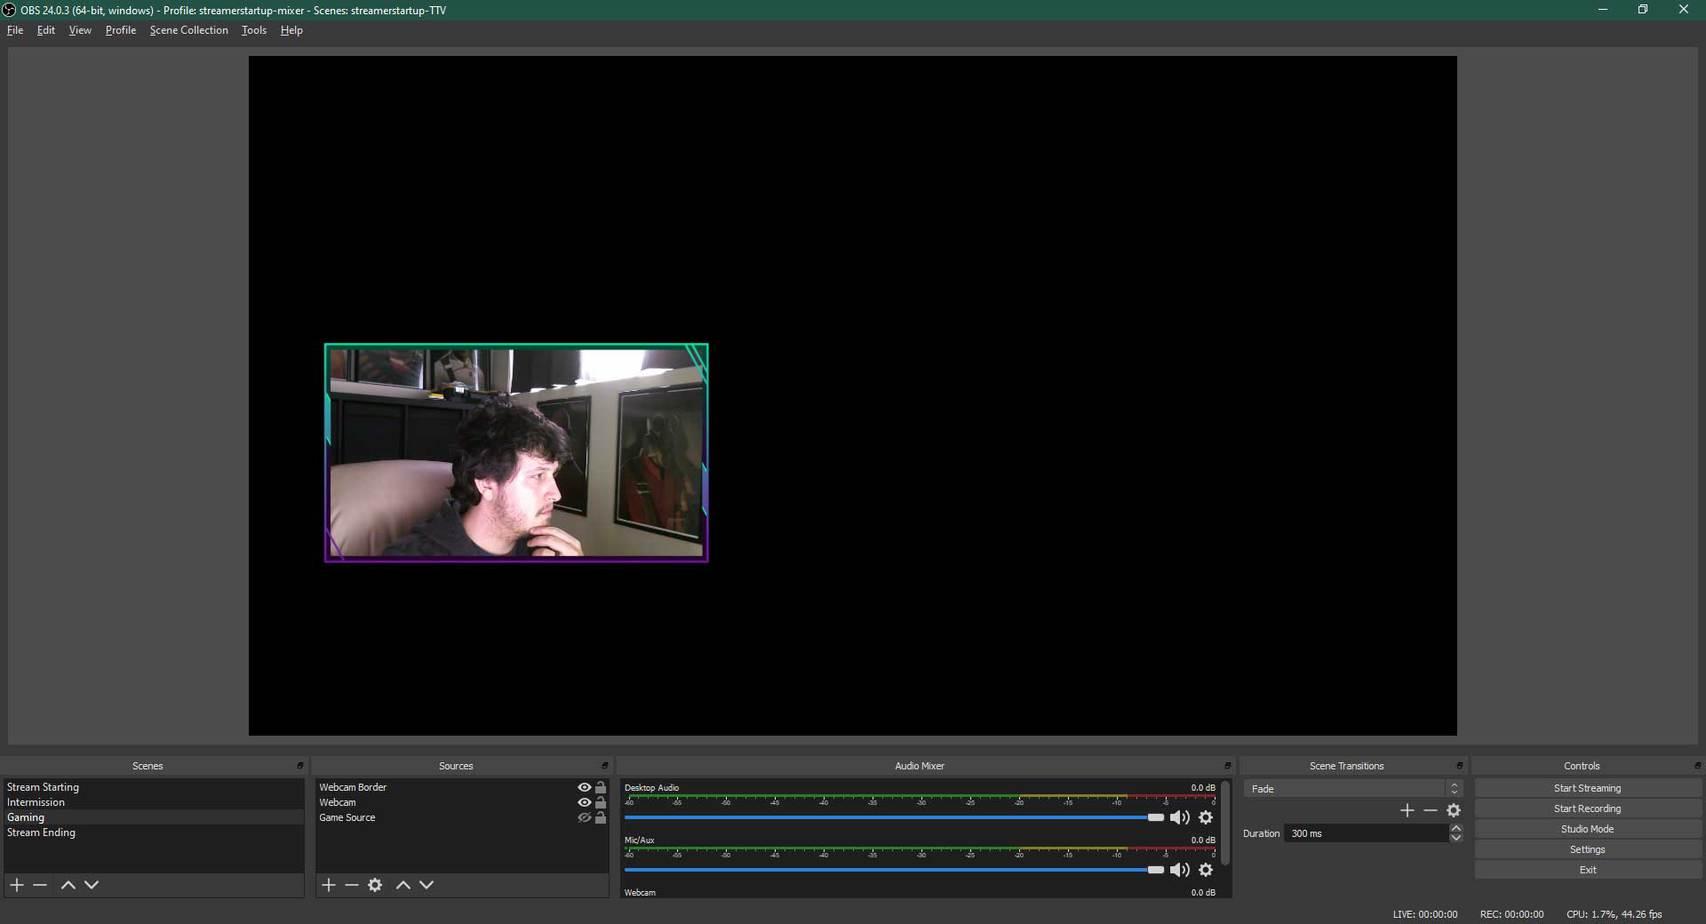 OBS Studio - Adding webcam overlay 2